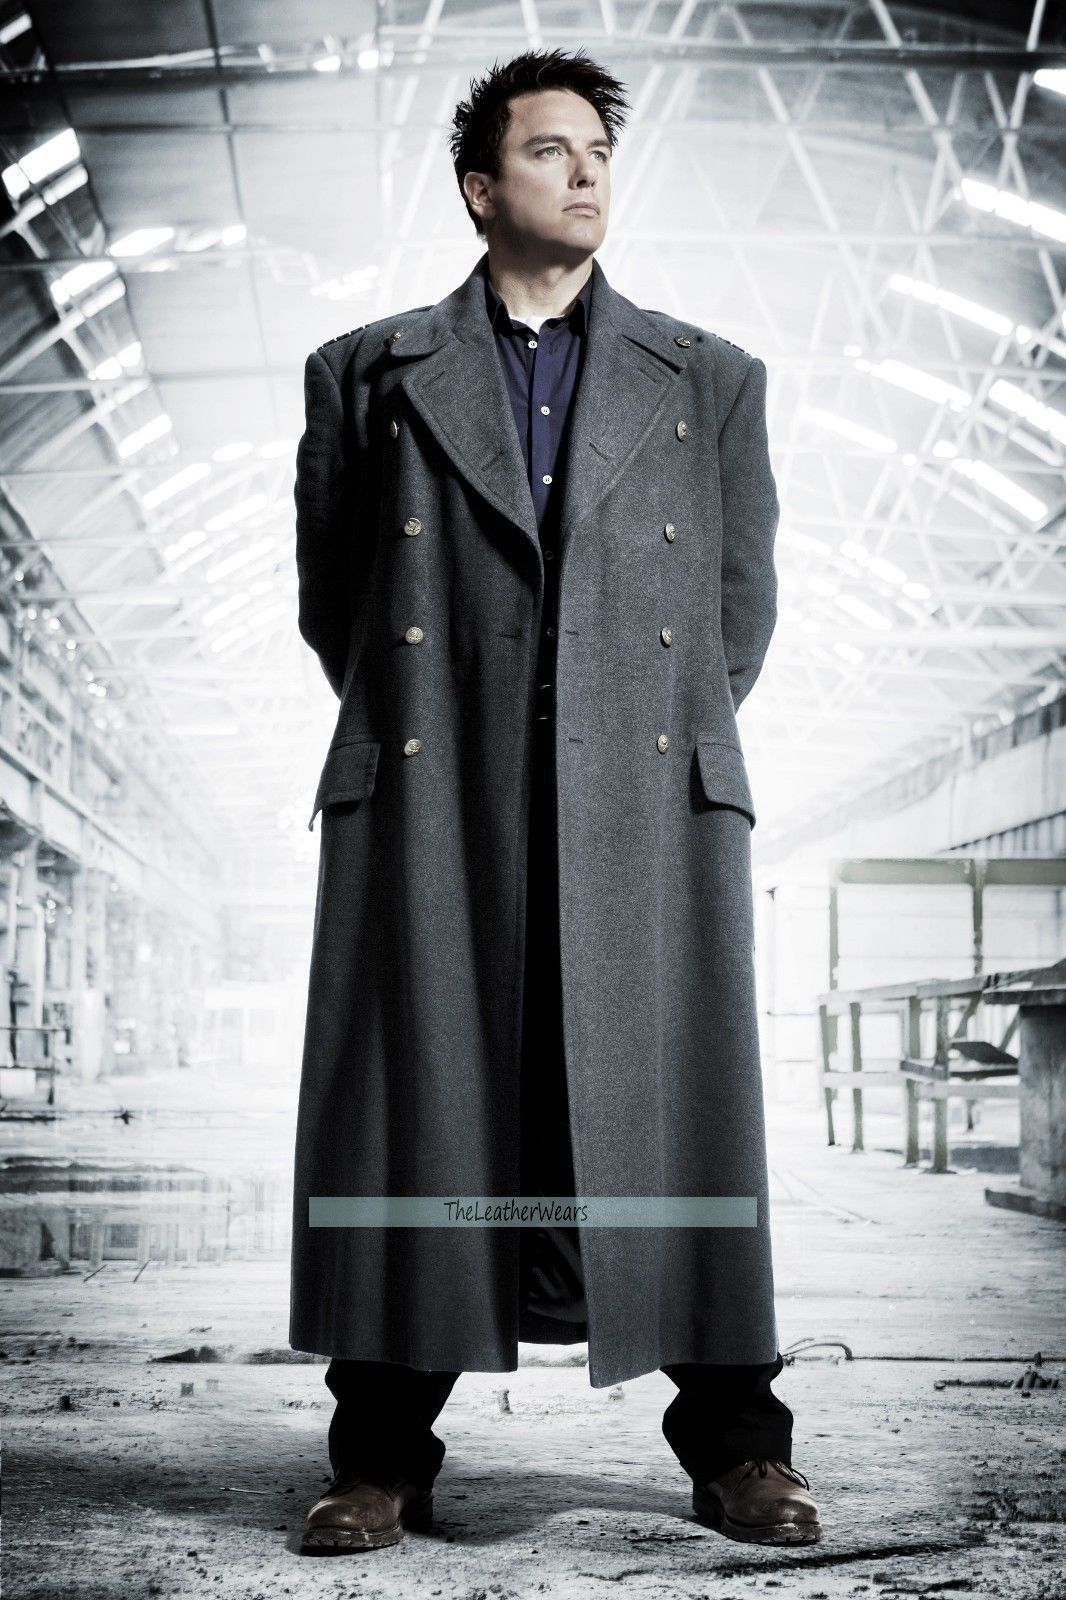 Doctor Who Captain Jack Harkness John Barowman Long Black Wool Blend Trench Coat